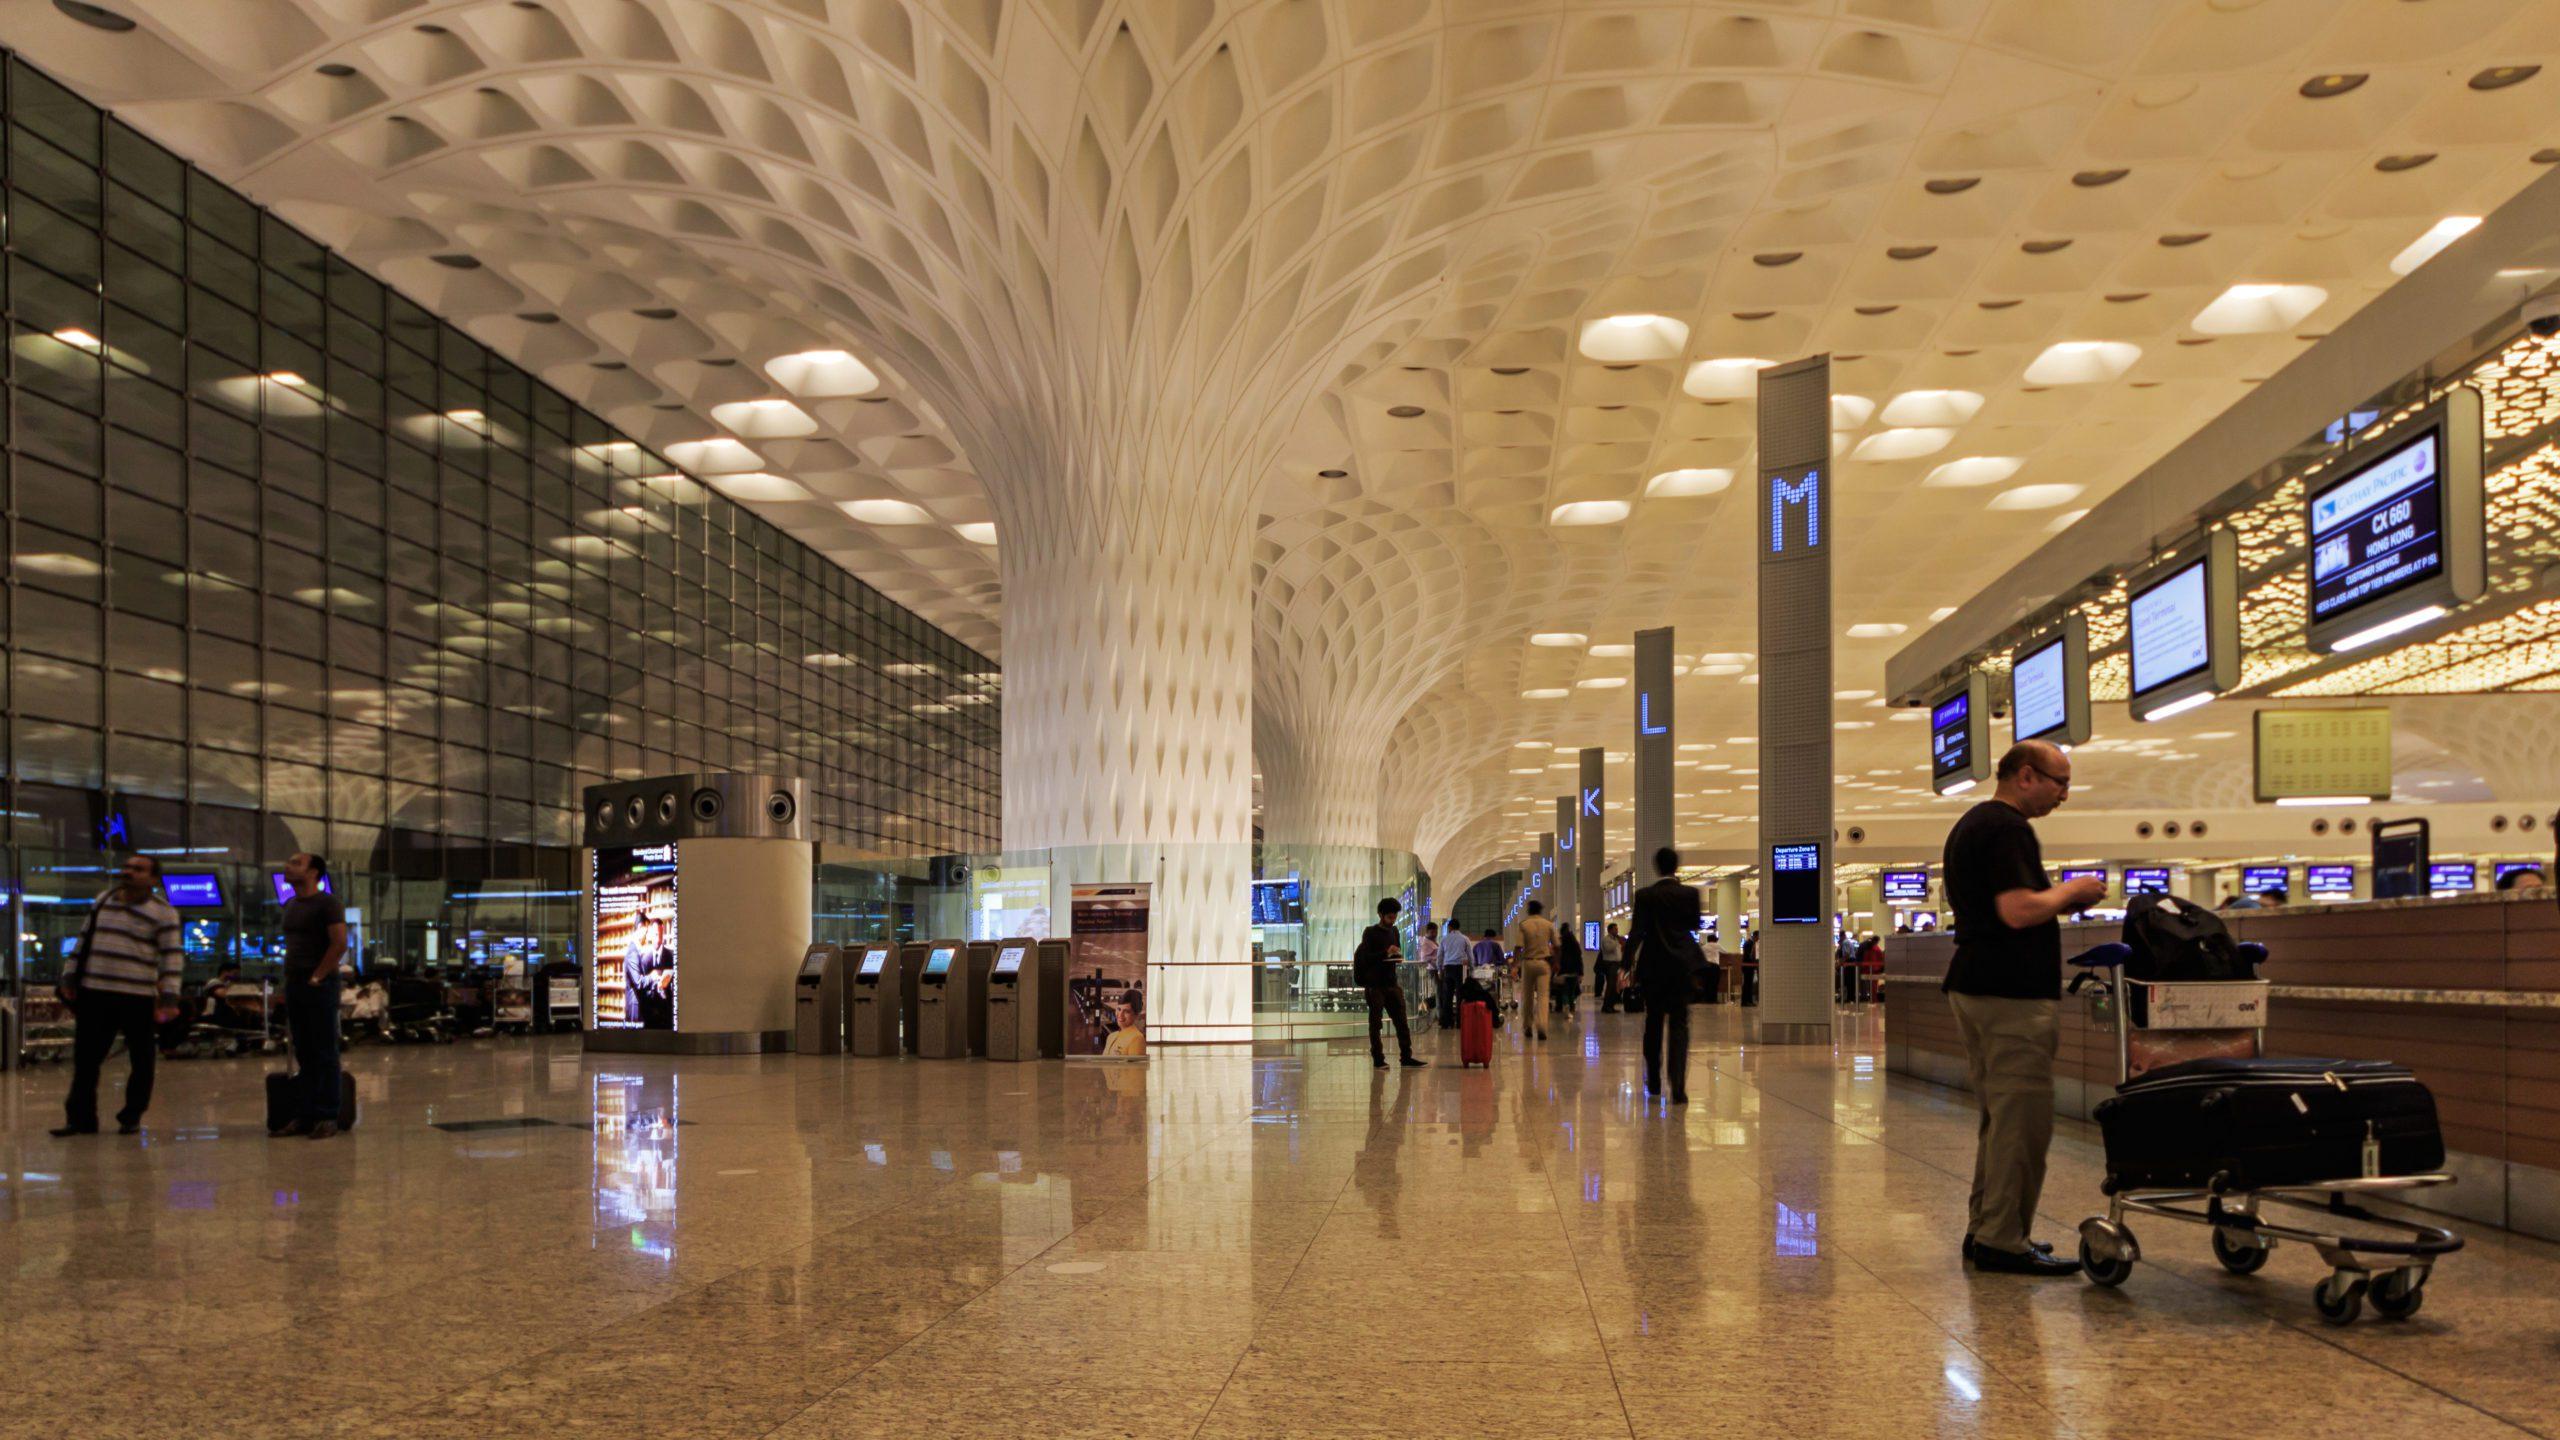 India's Daily Passenger Count Surpasses 200,000!